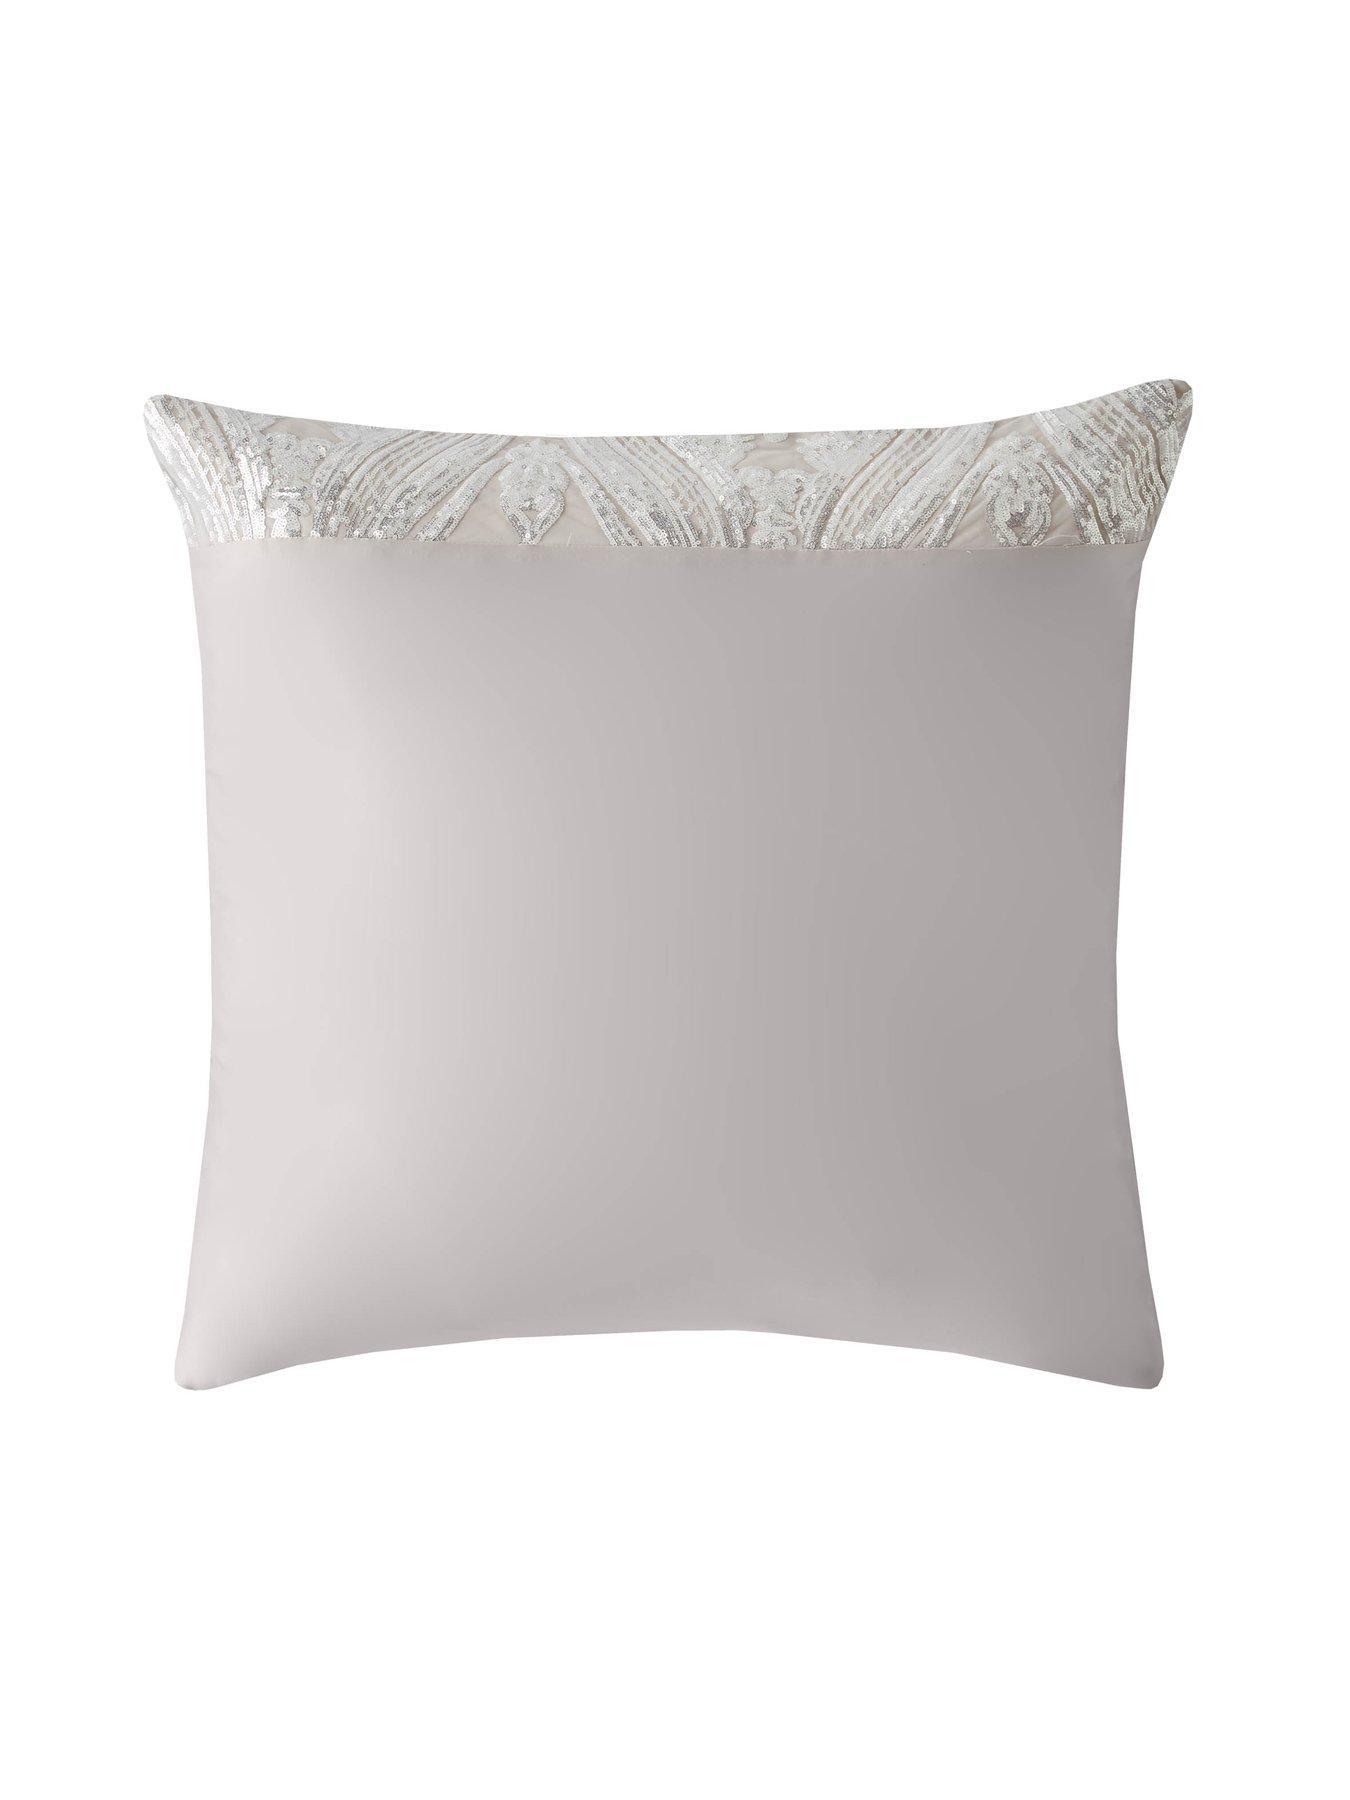 2 X FACTORY CLEARANCE Dorma 100/% Cotton WHITE Oxford Pillowcase,50x75cm+5 cm